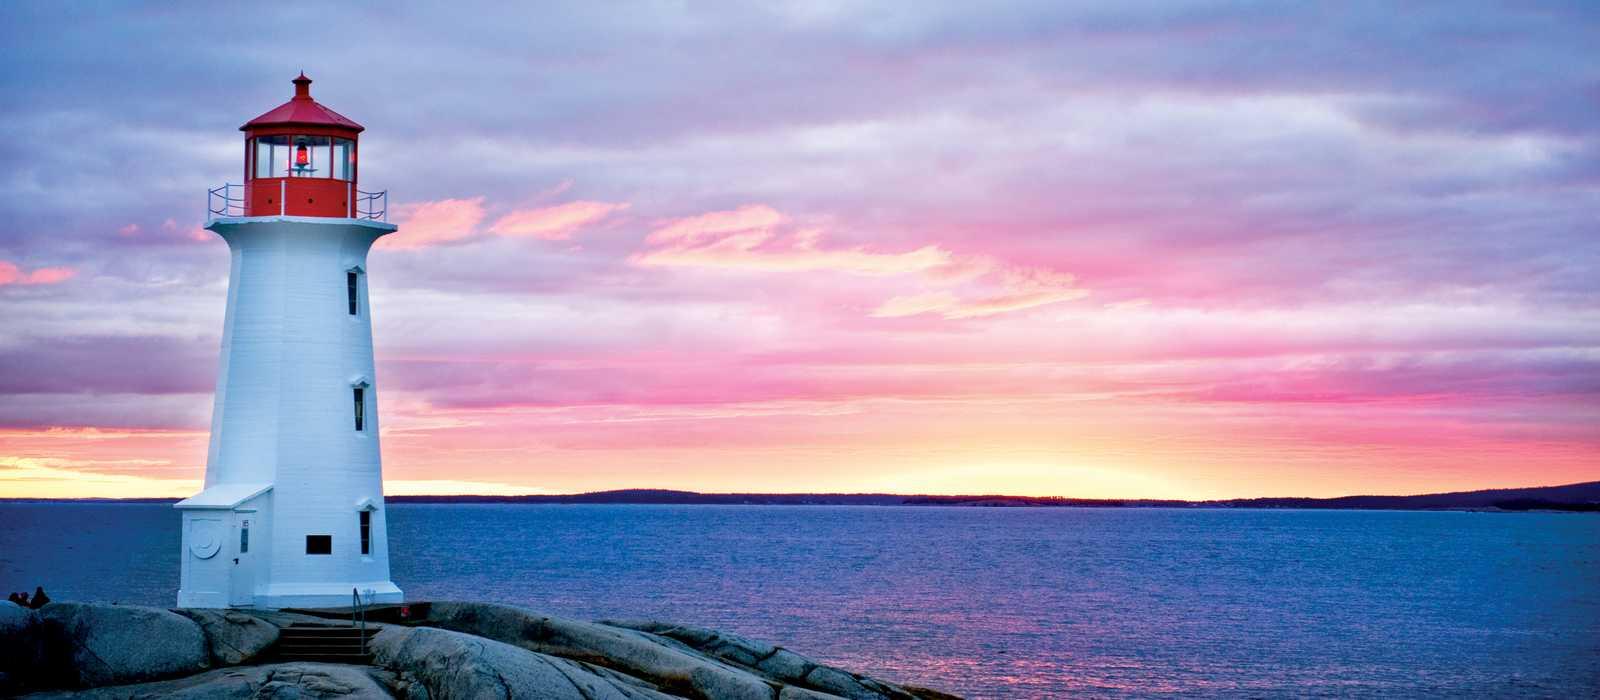 Sonnenuntergang an Peggys Cove